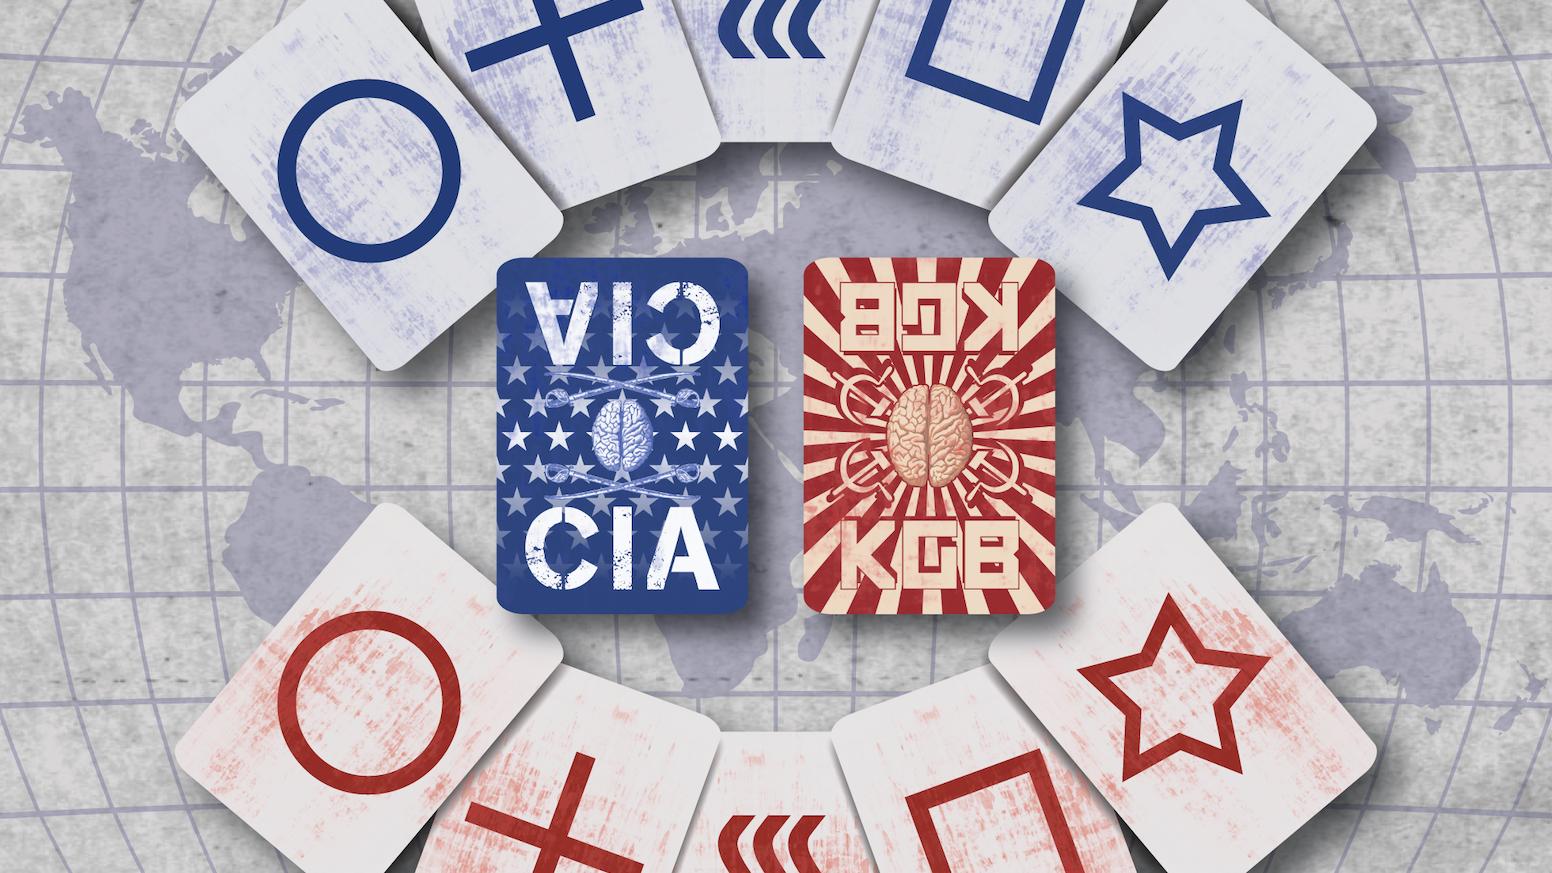 Codename: Oracle Card Game by Wishing Tree Games — Kickstarter